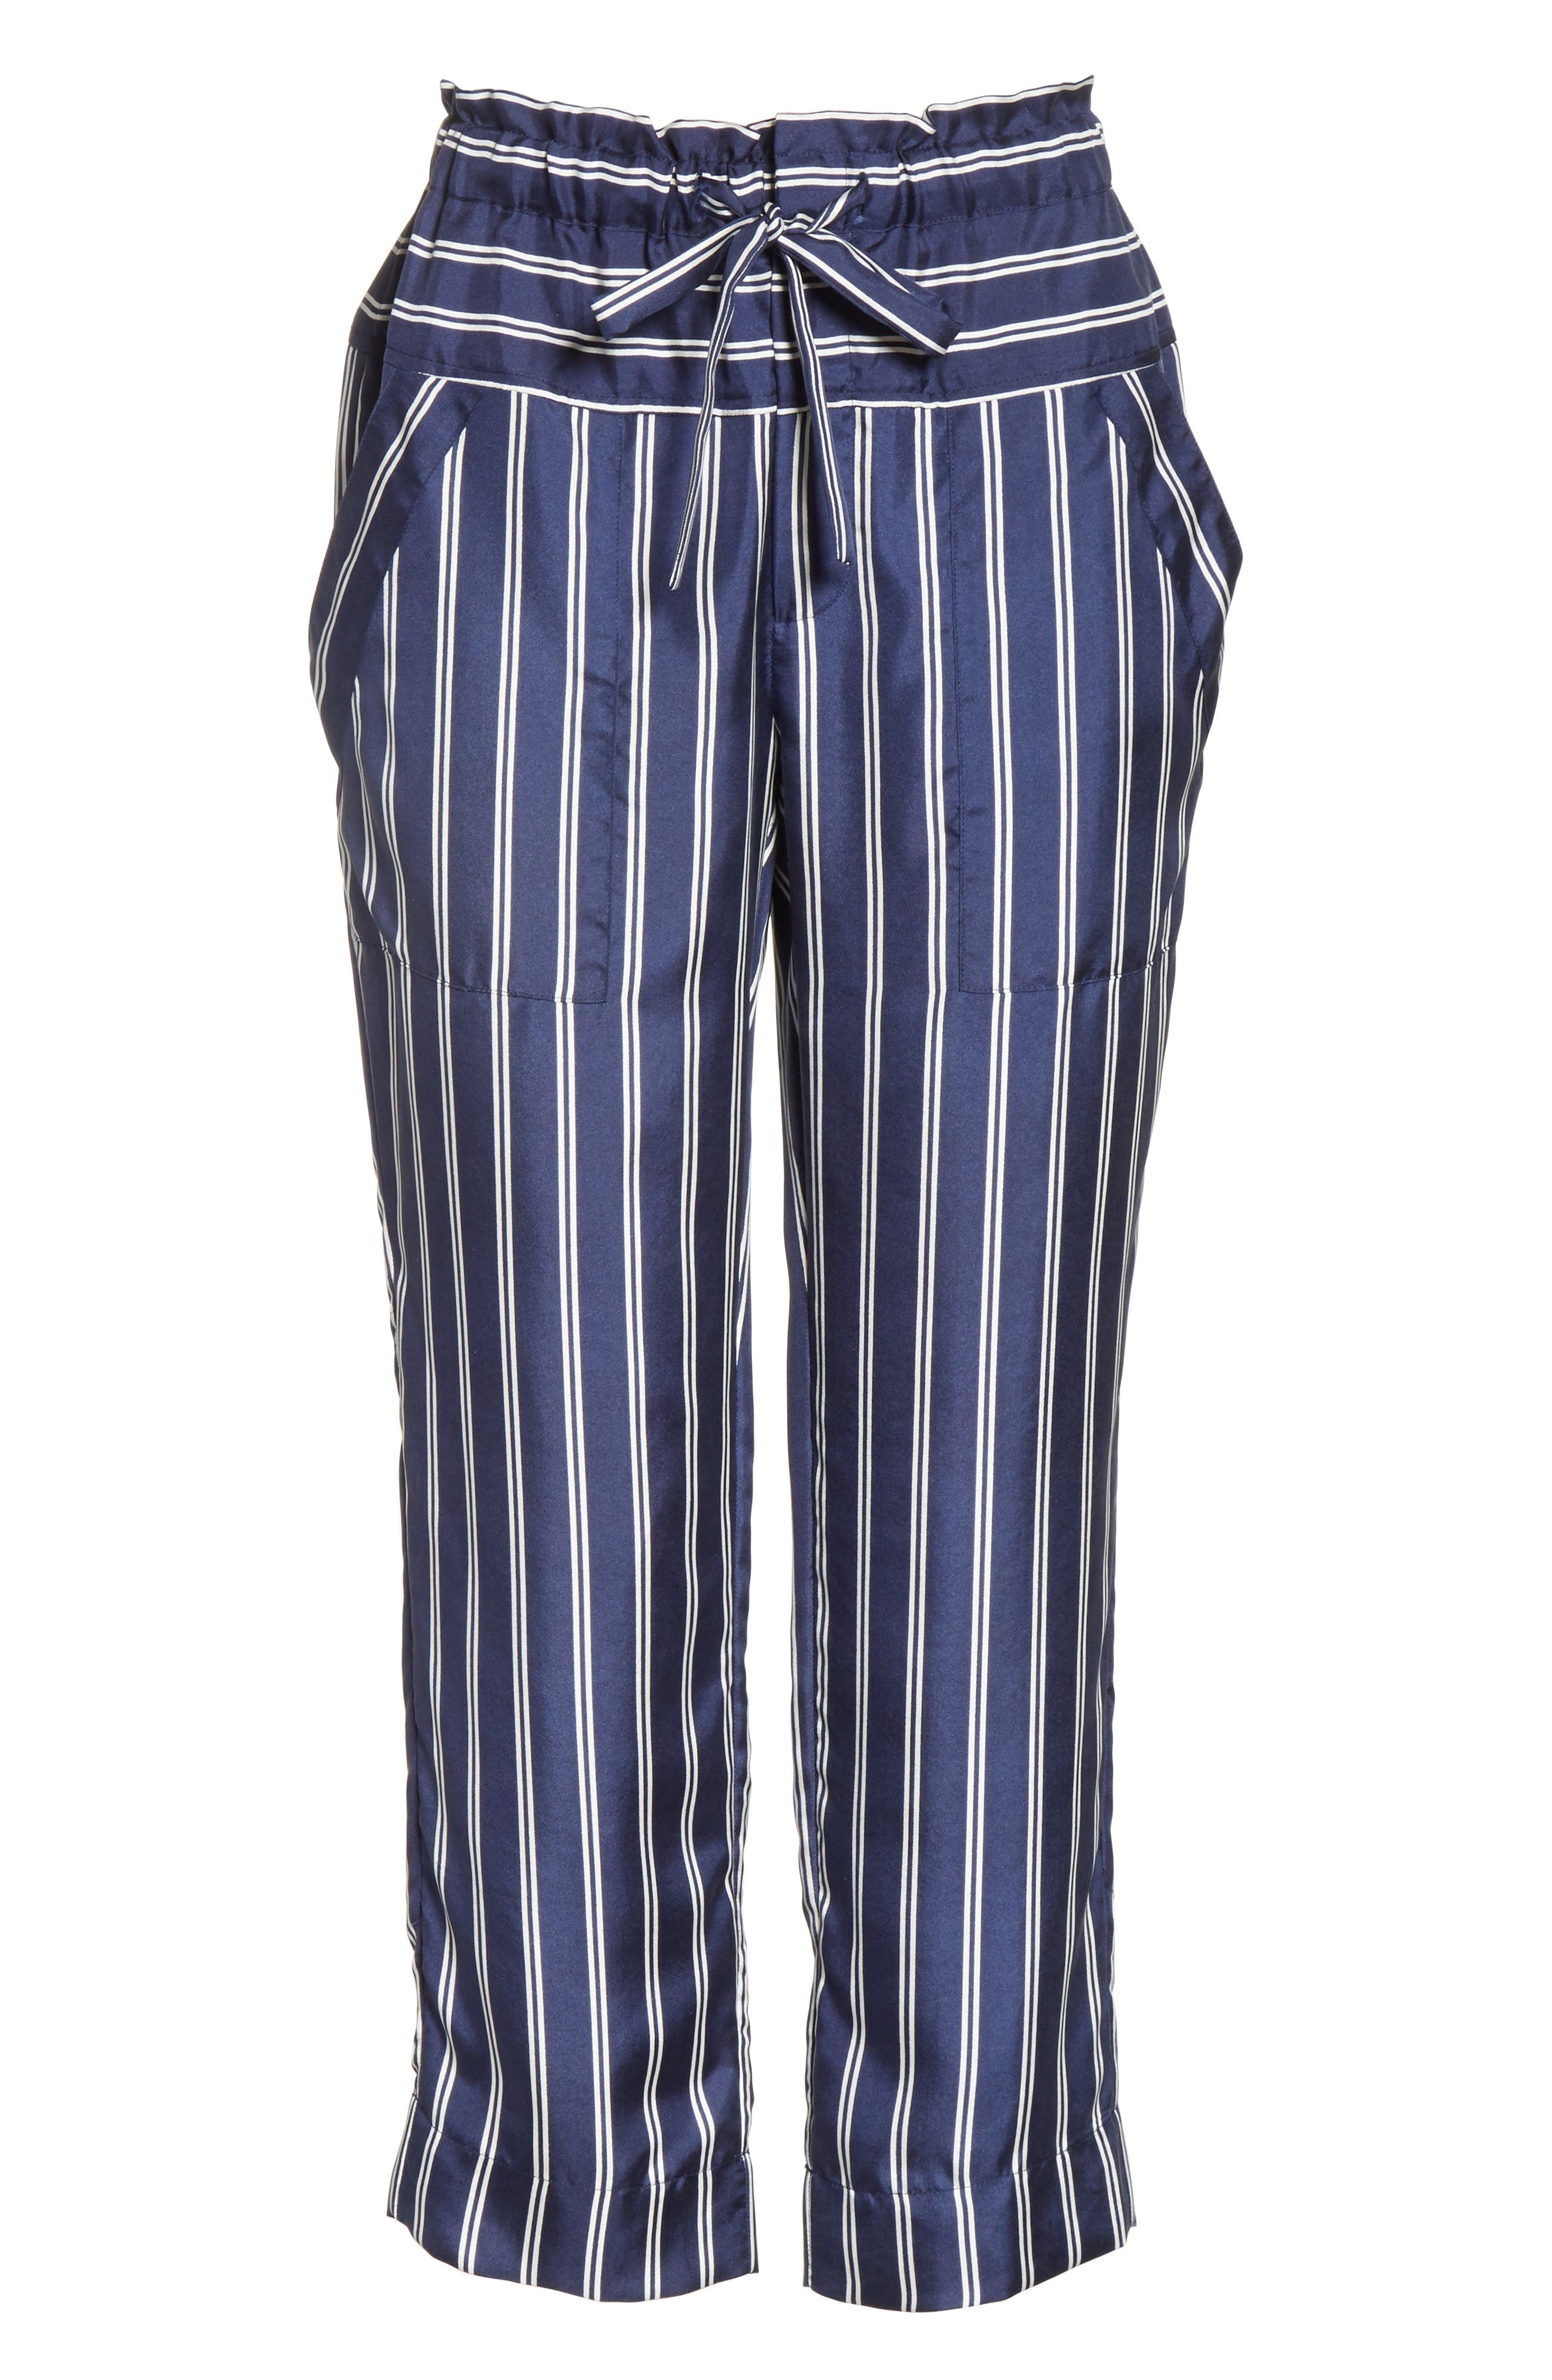 Addiena Stripe Silk Pants,                             Alternate thumbnail 6, color,                             418